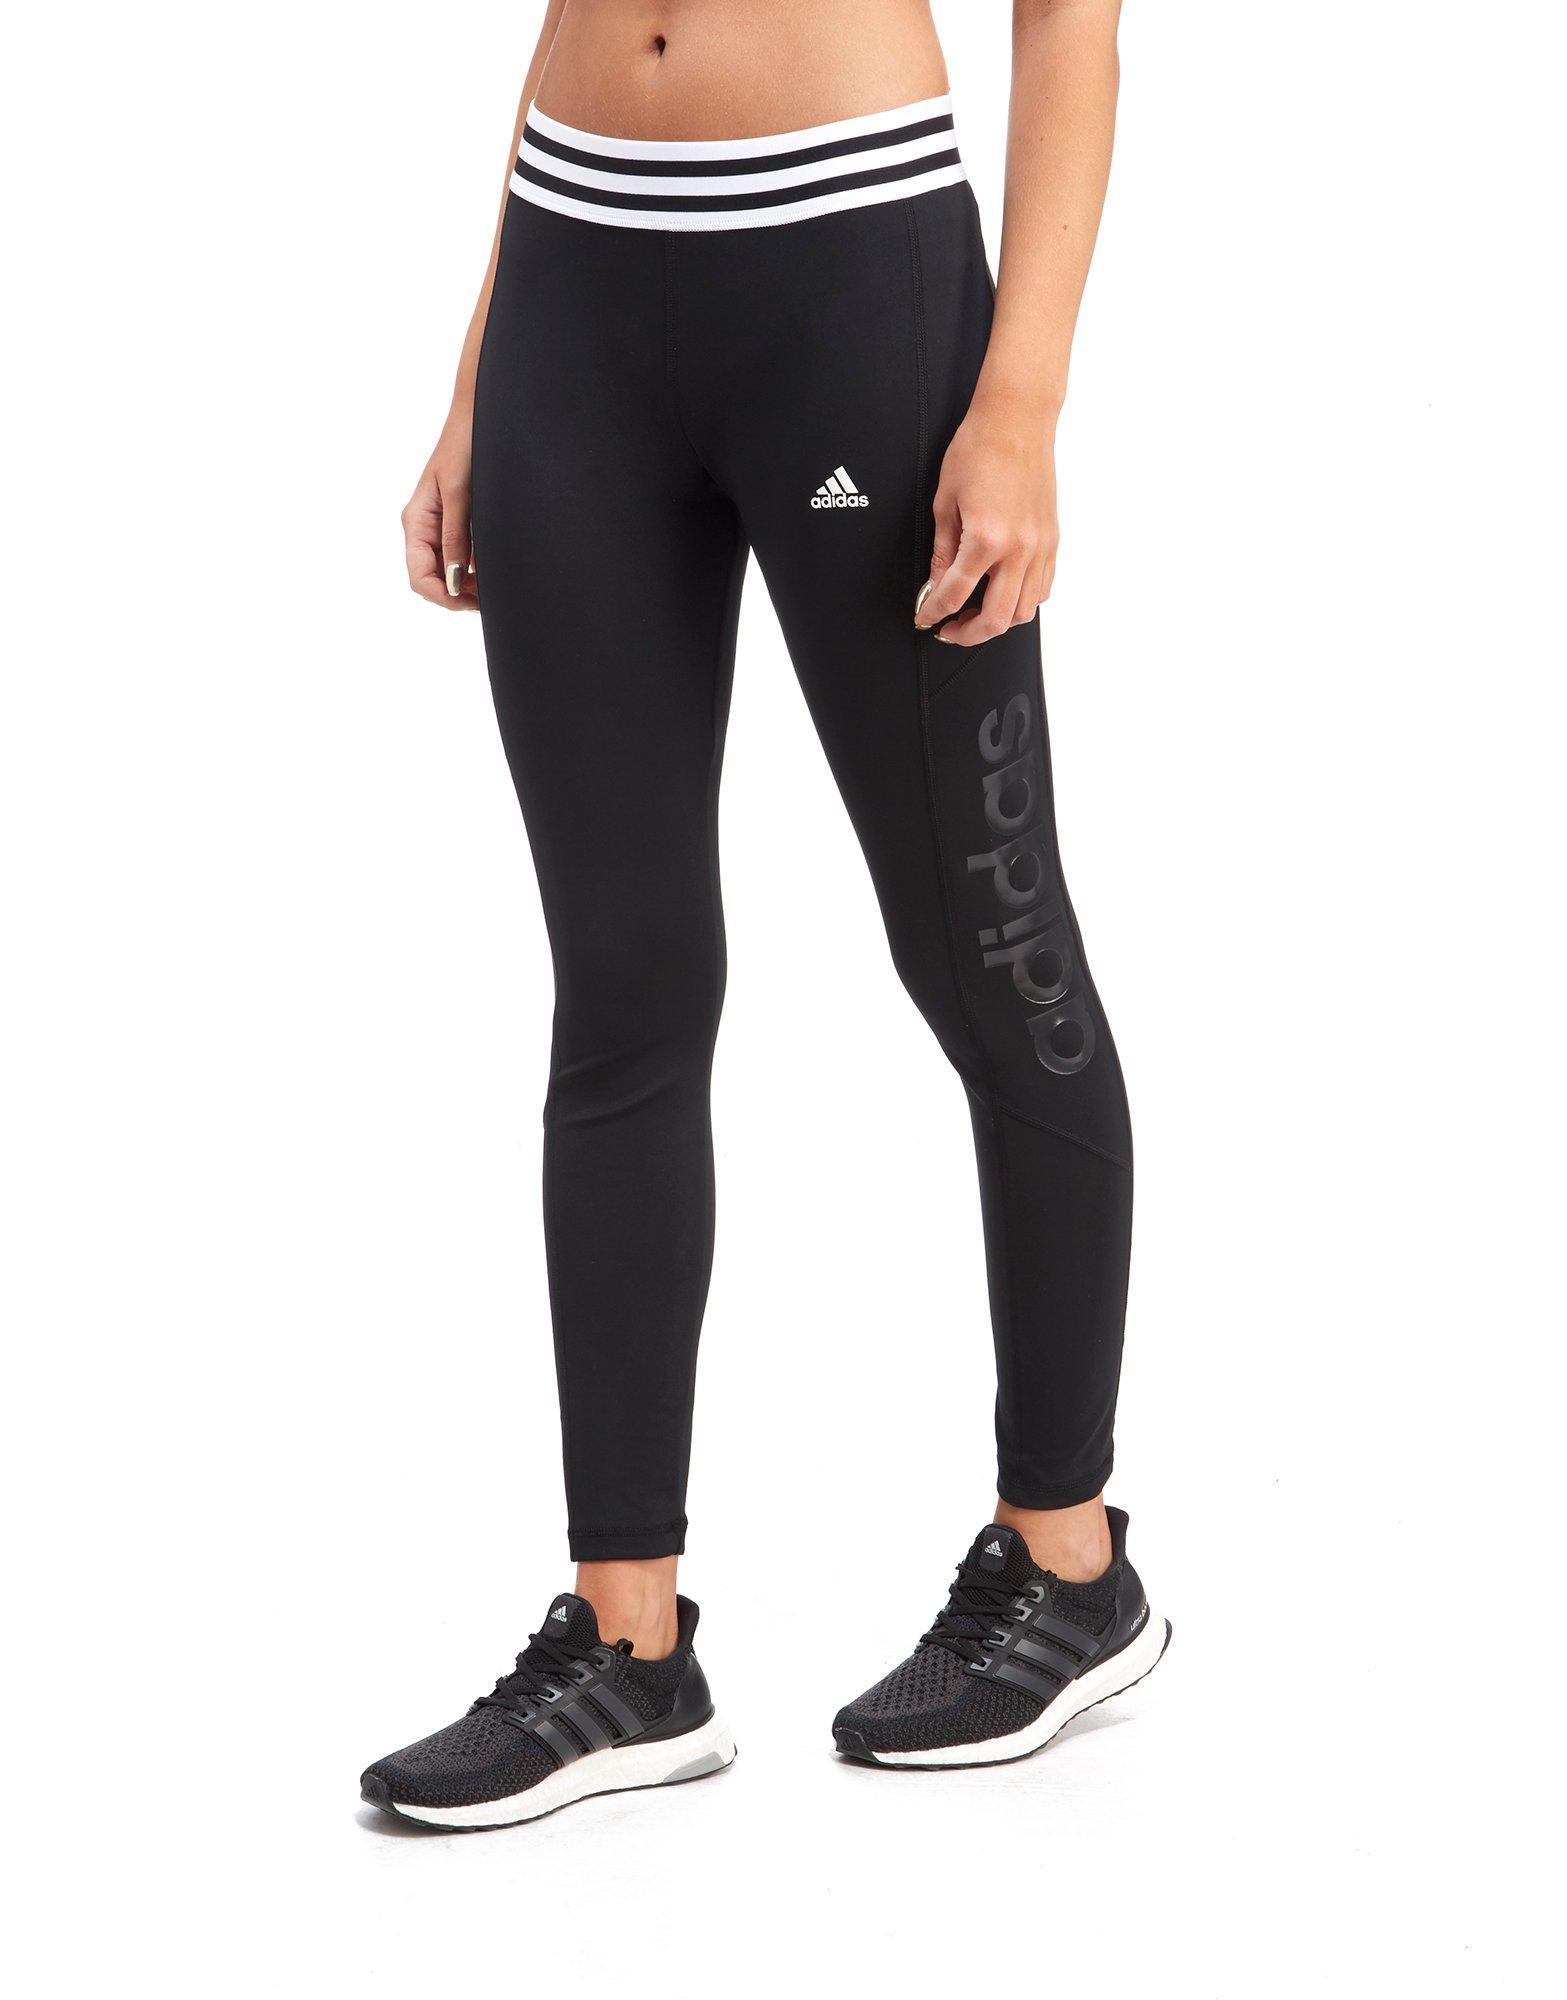 jd_263744_a?qlt=80 sale adidas womens clothing jd sports,Womens Clothing Adidas